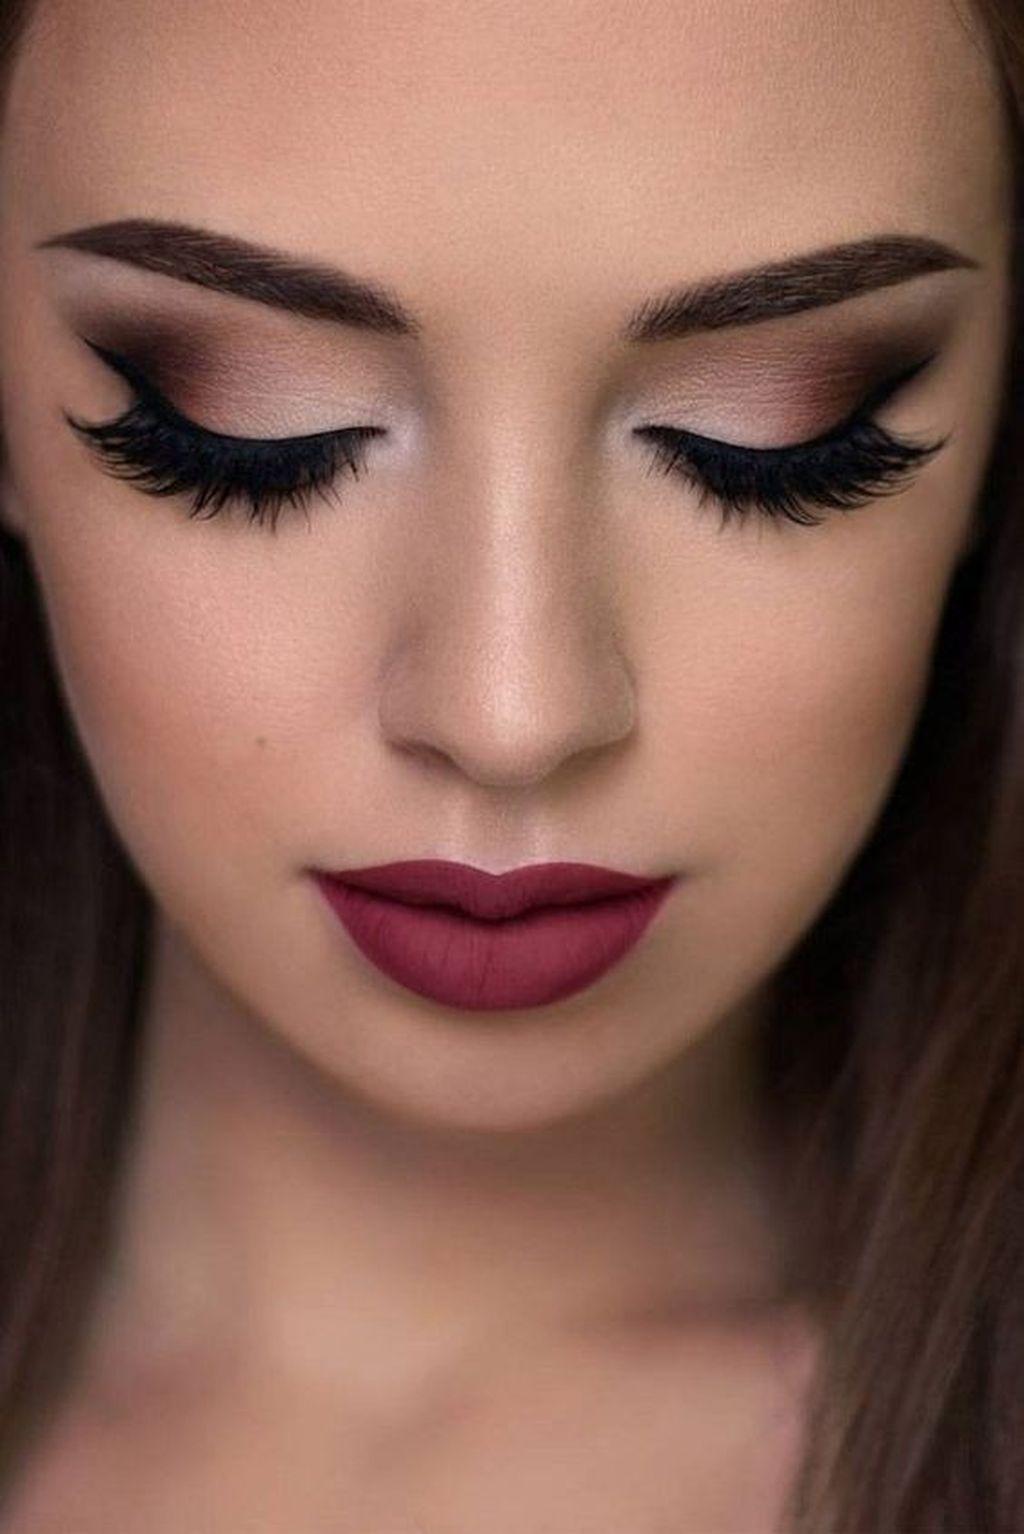 36 popular simple smokey eyes makeup ideas | makeup | eye